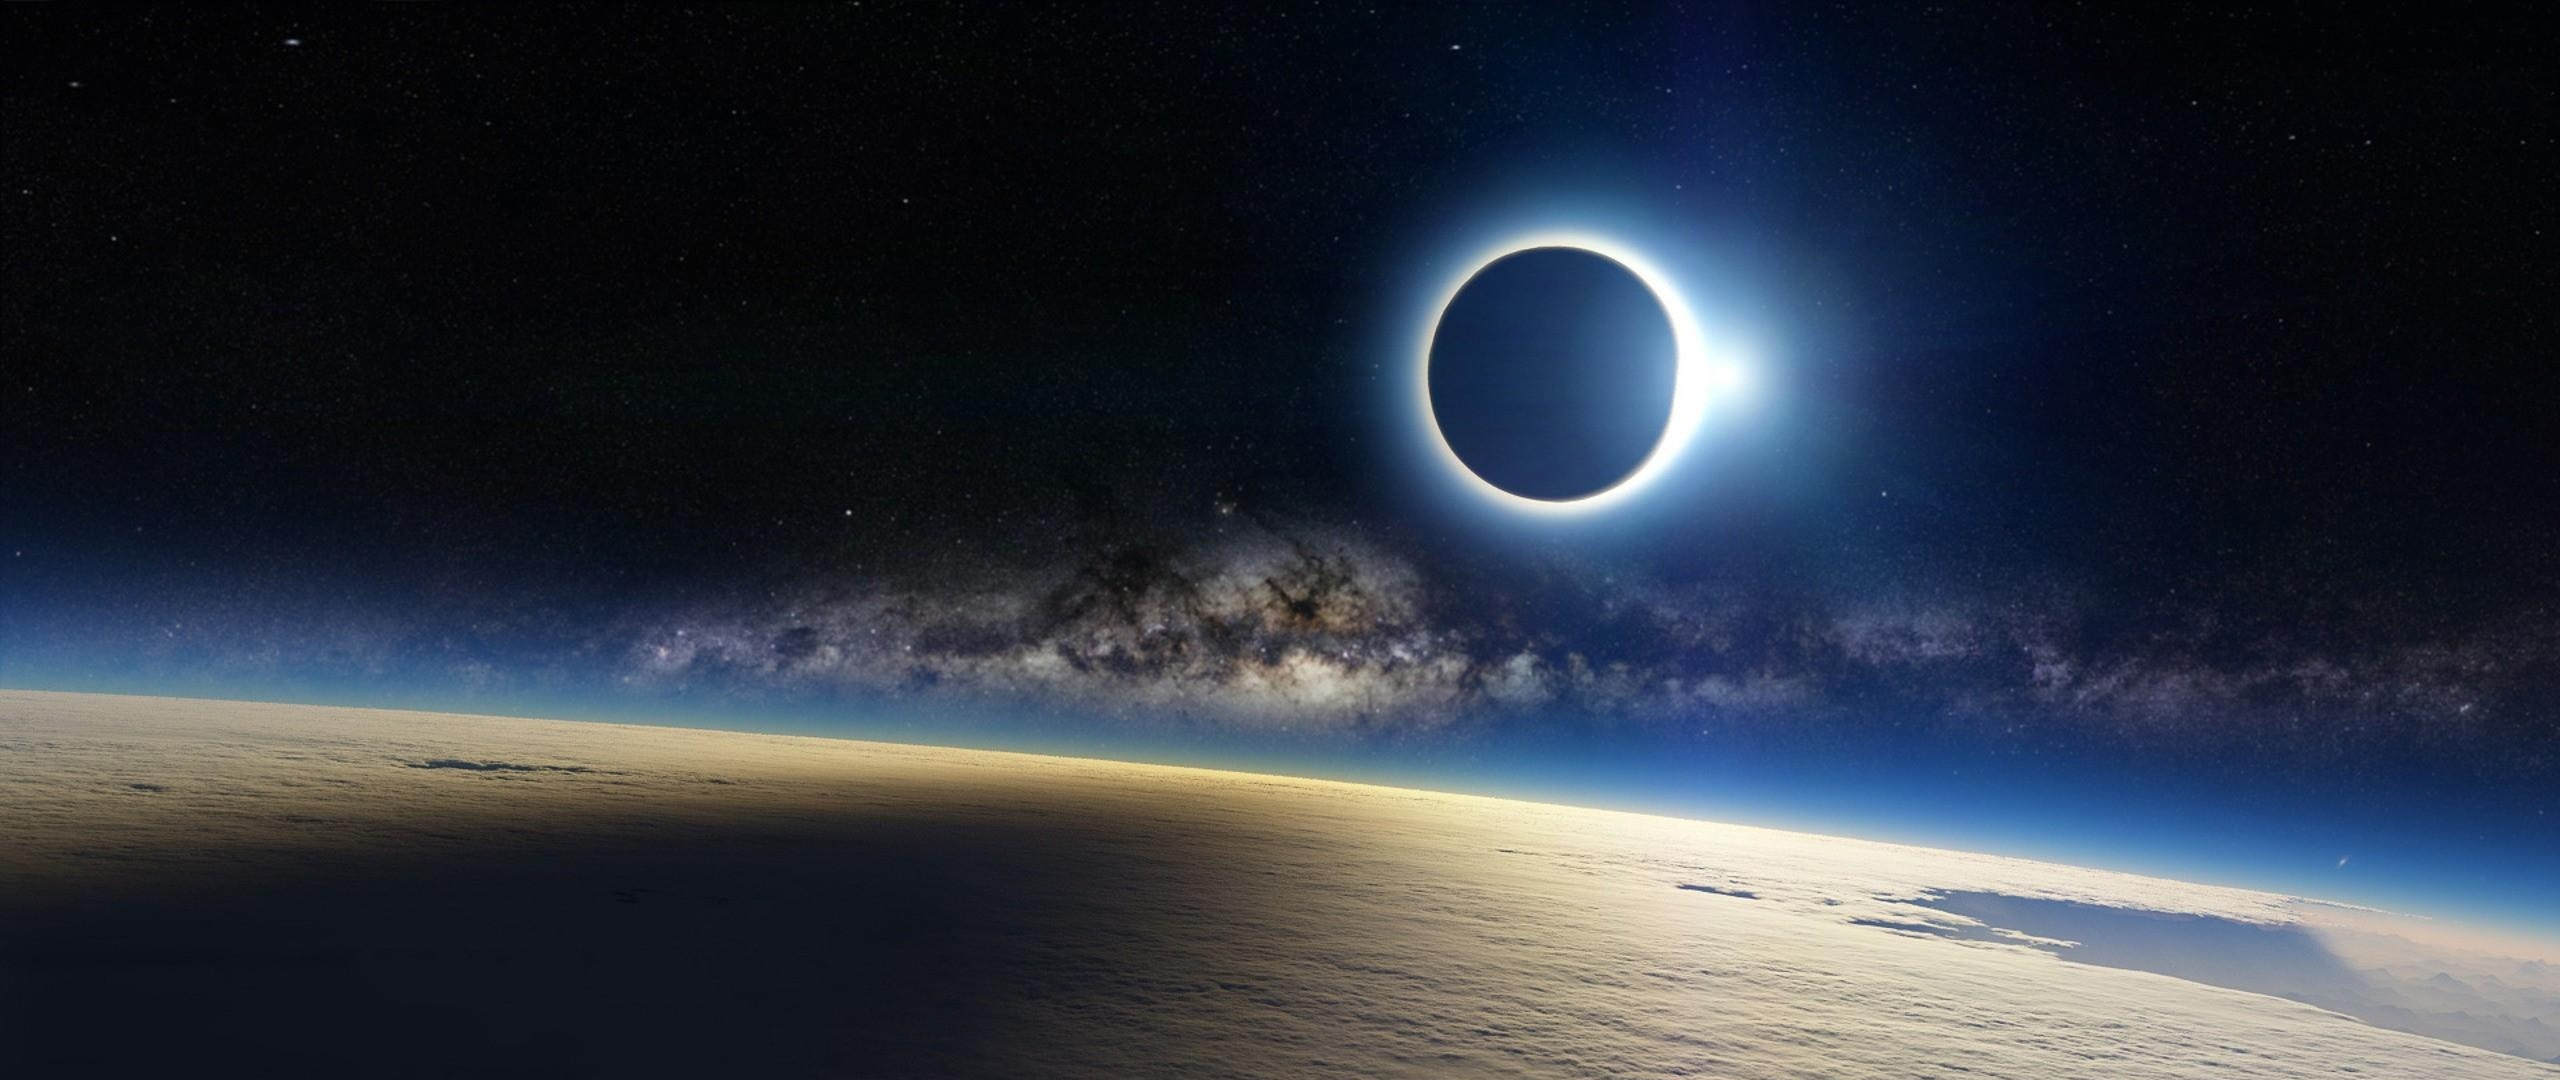 Wallpaper 2560x1080 clouds milky way eclipse light 2560x1080 2560x1080